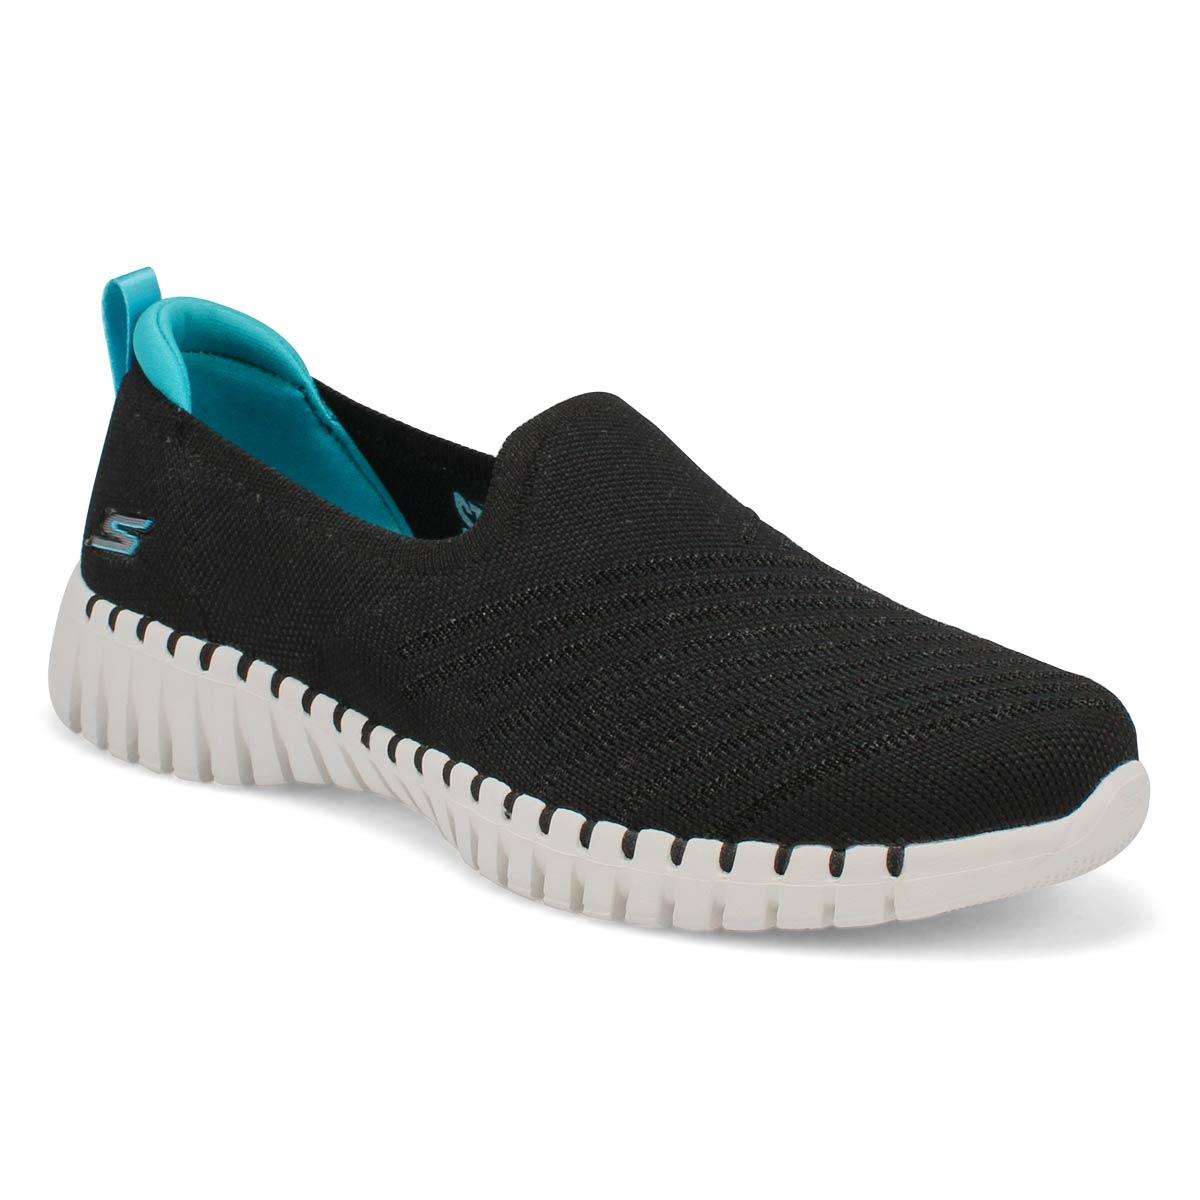 Chaussures GO WALK SMART,noir/turquoise,femmes